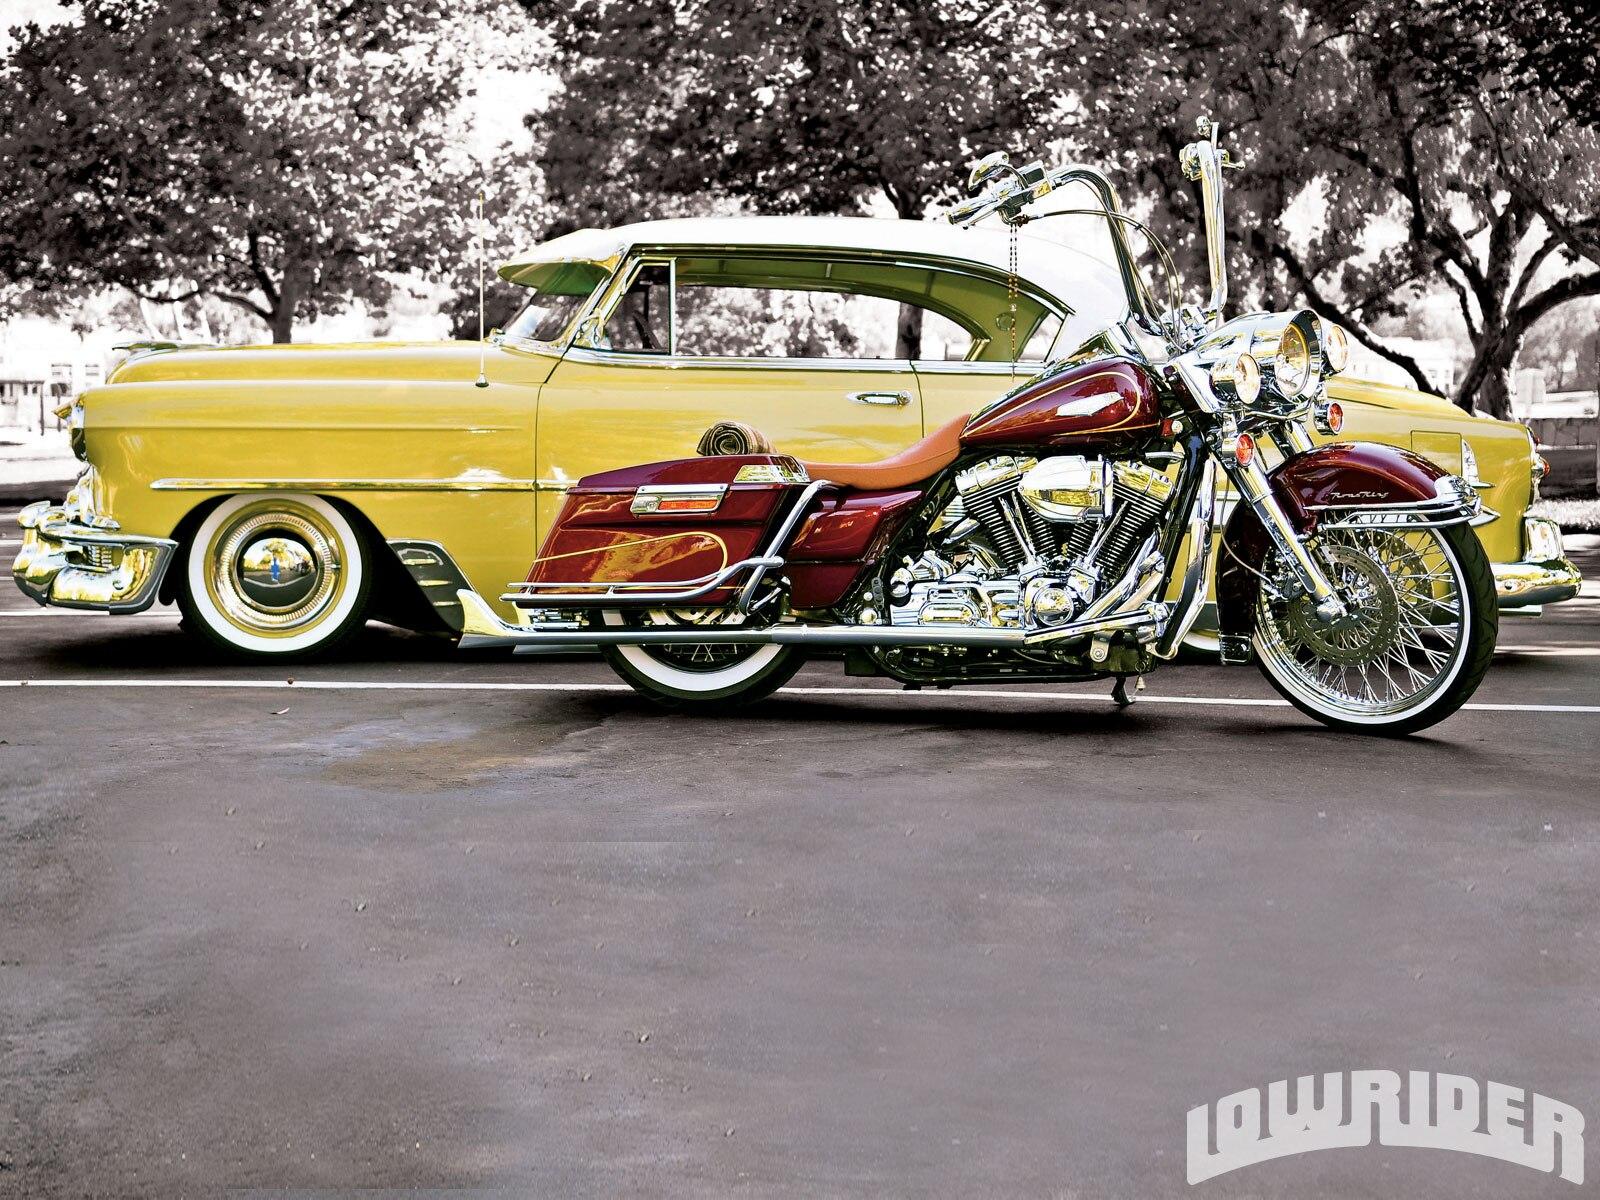 lrmp_1007_01_o-1953_chevrolet_bel_air-and_2004_harley_road_king4